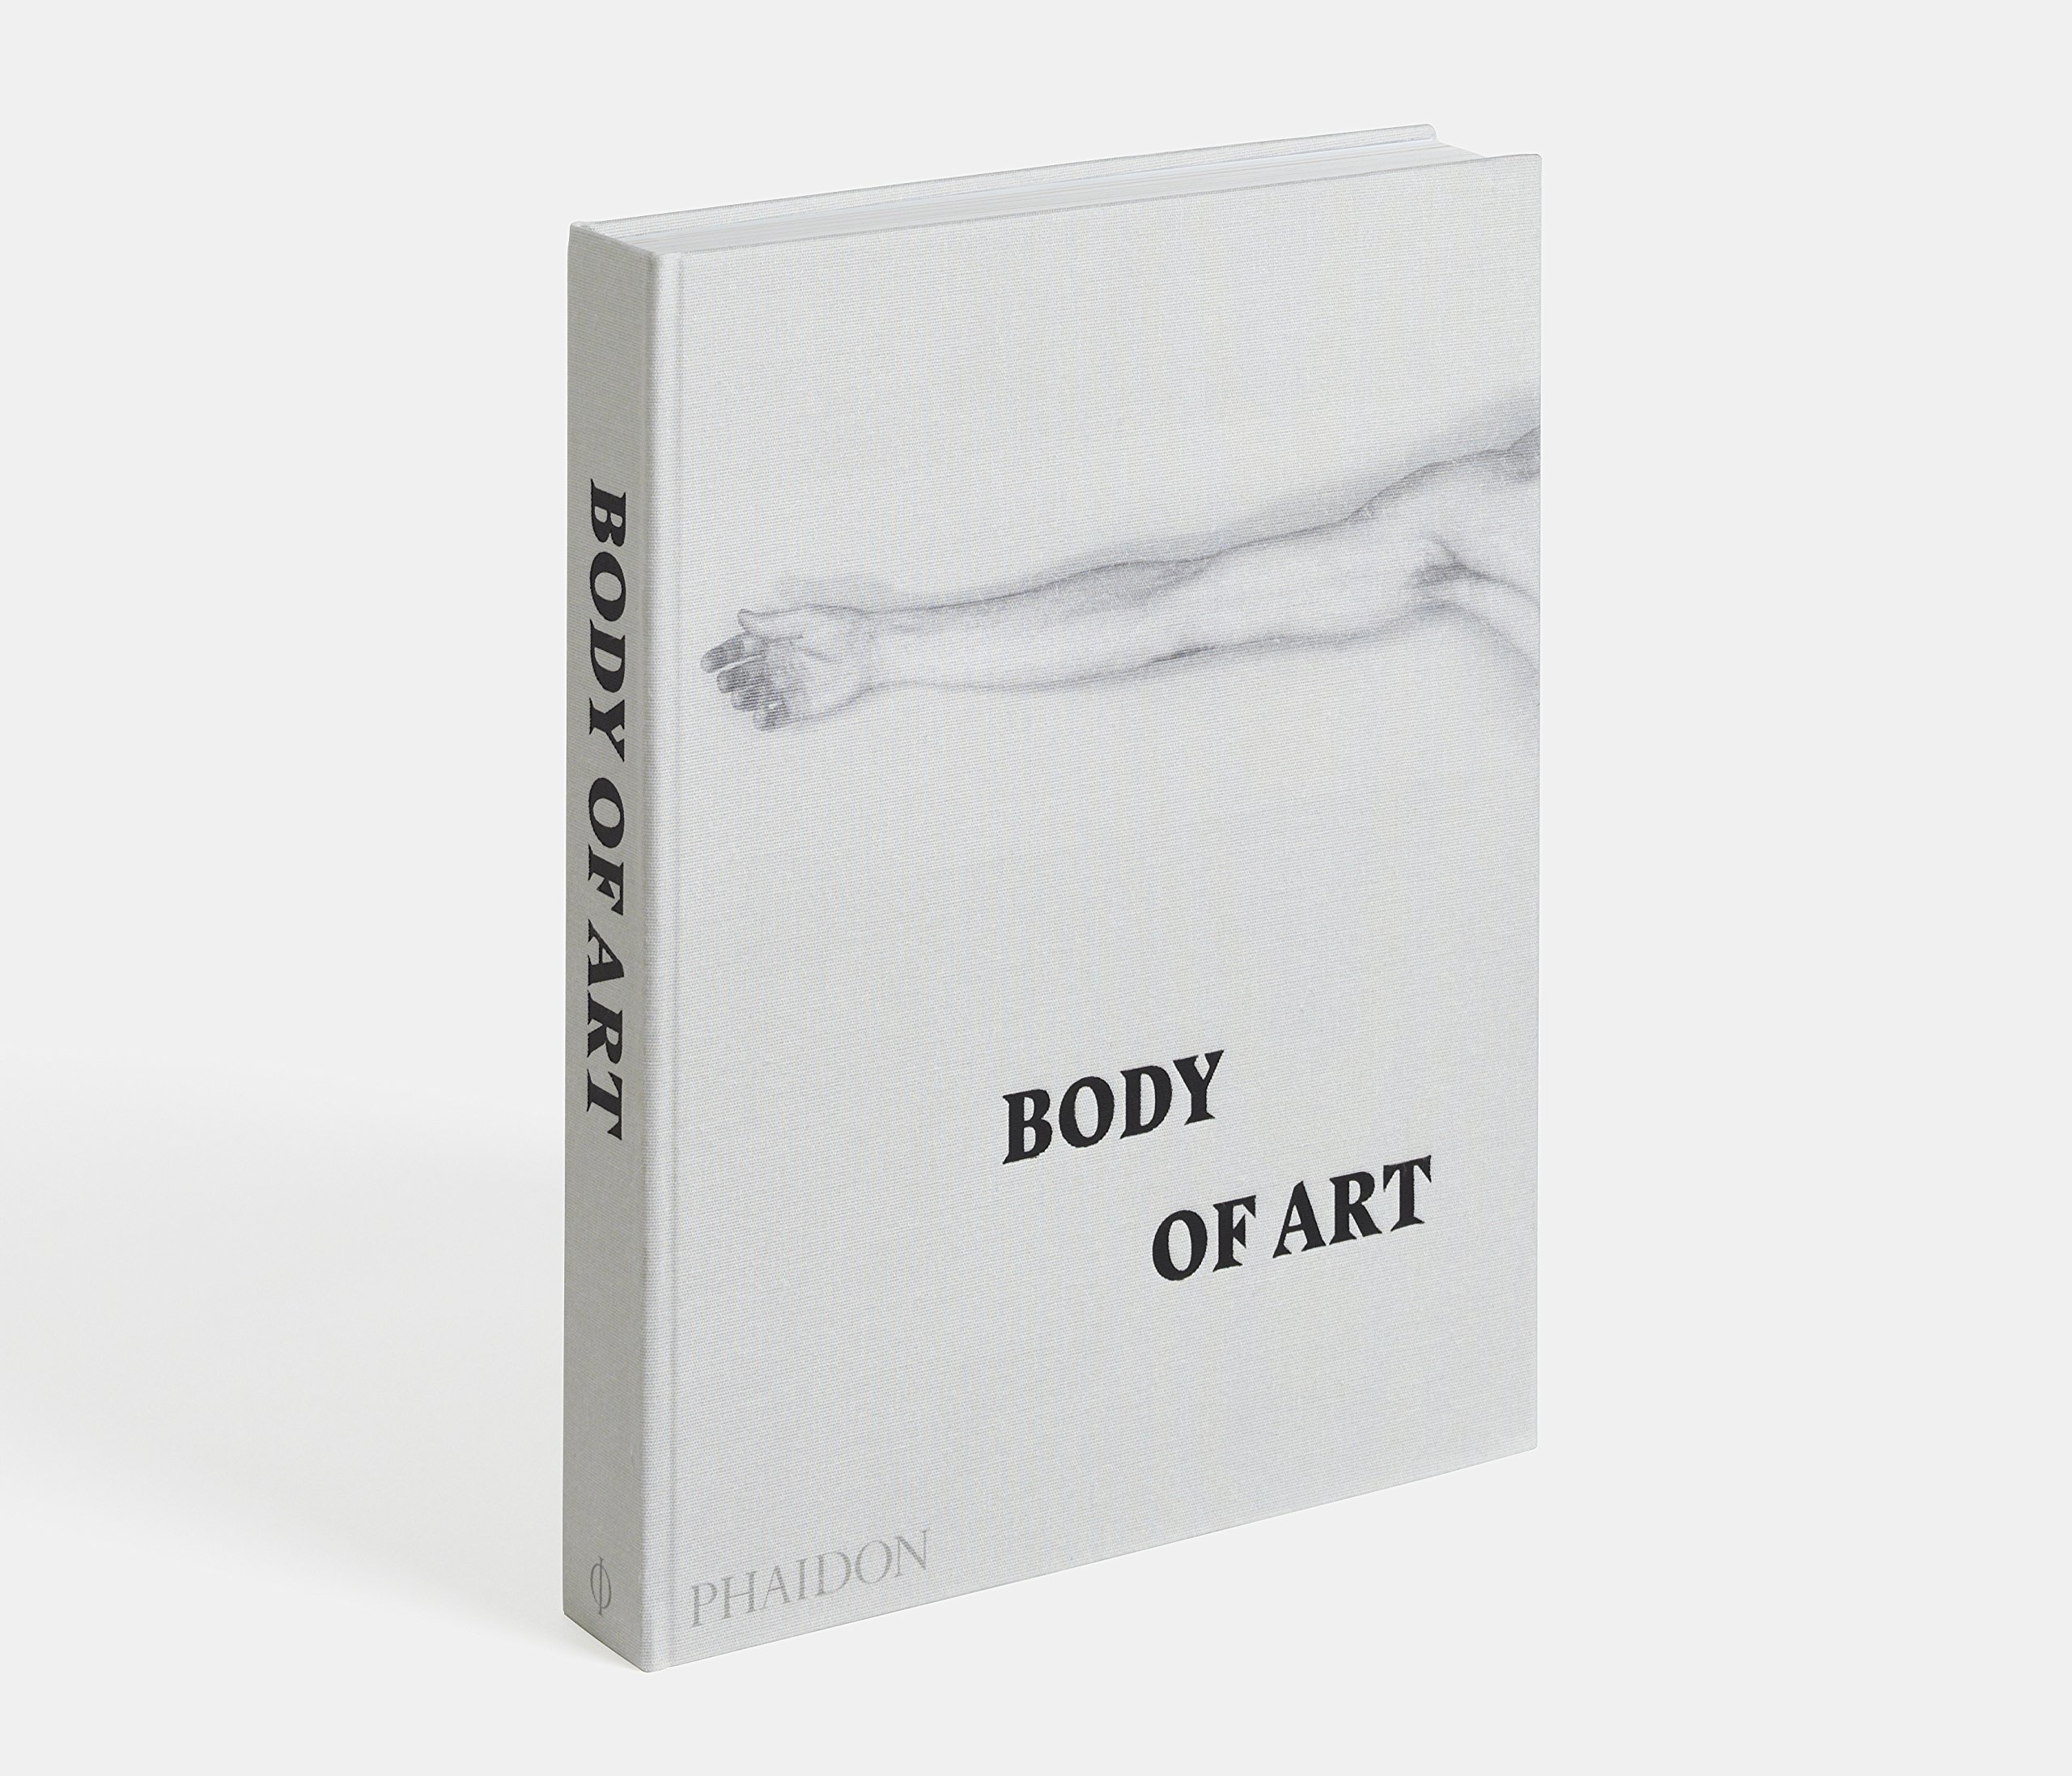 Body Of Art Aaronson Deborah Diane Fortenberry Rebecca Morrill Eds 9780714869667 Amazon Com Books